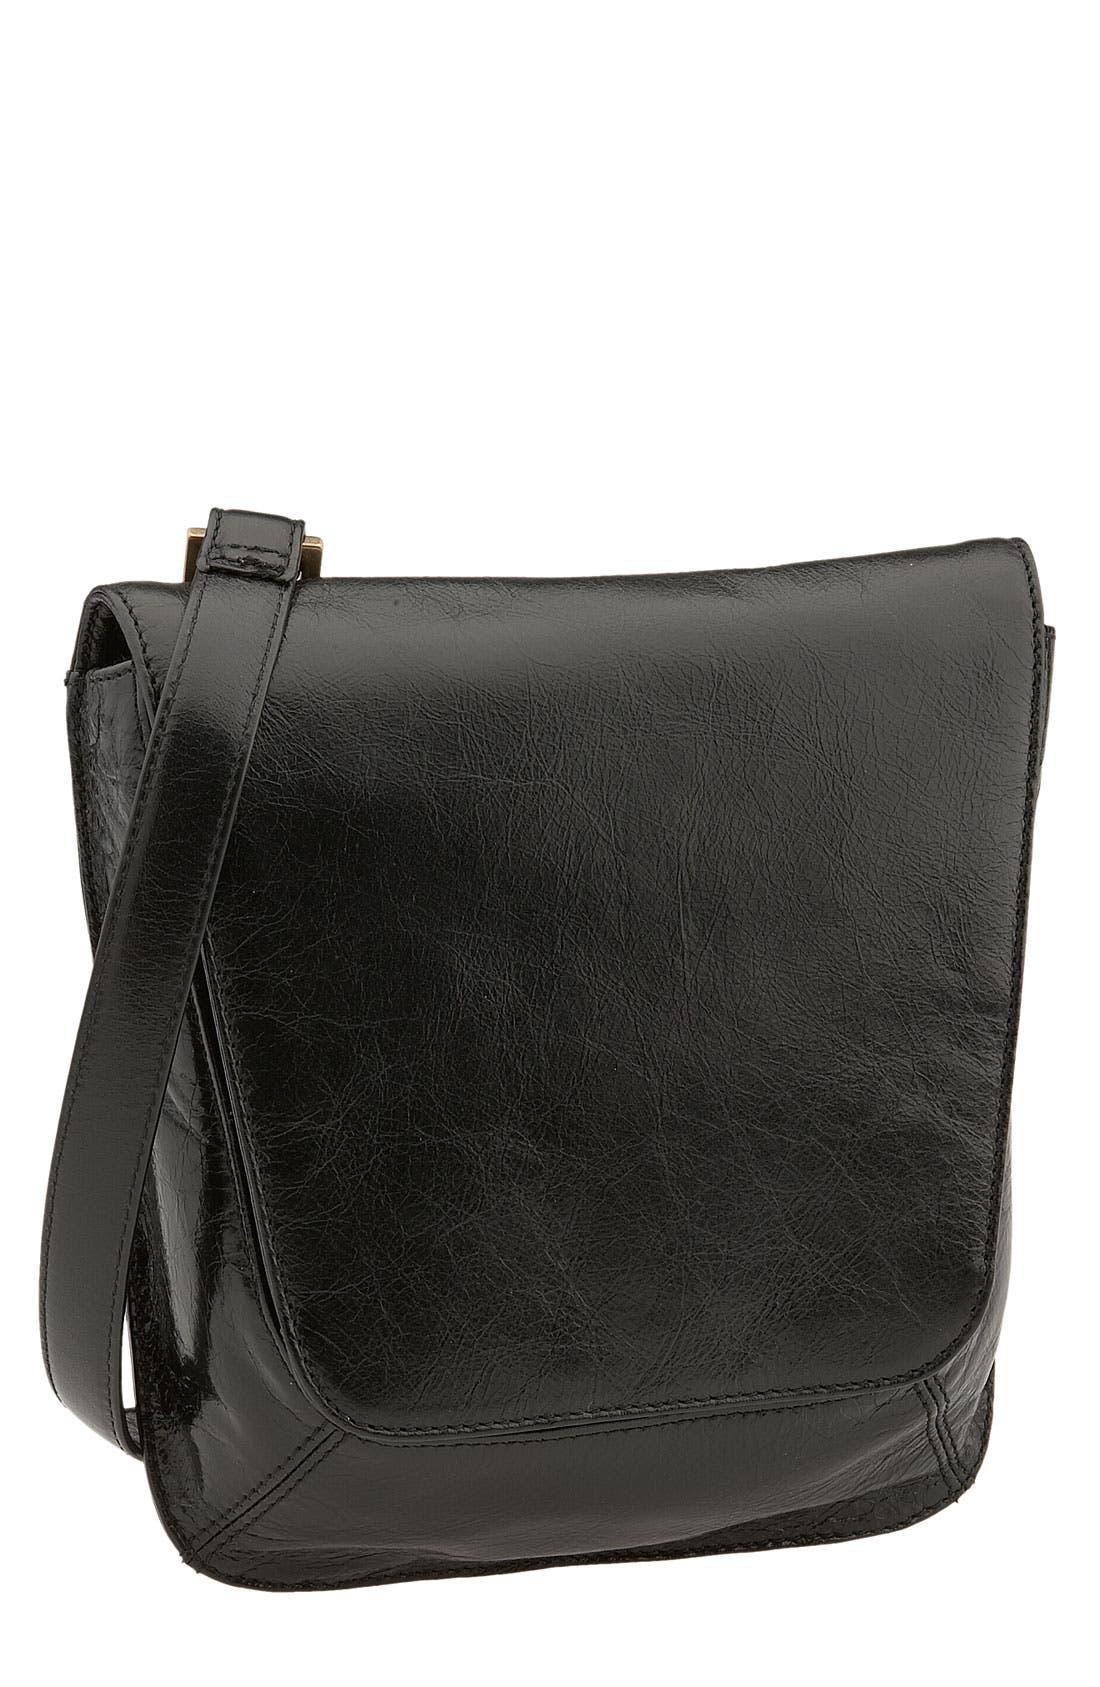 HOBO 'Dylan' Flap Crossbody Bag, Main, color, 001